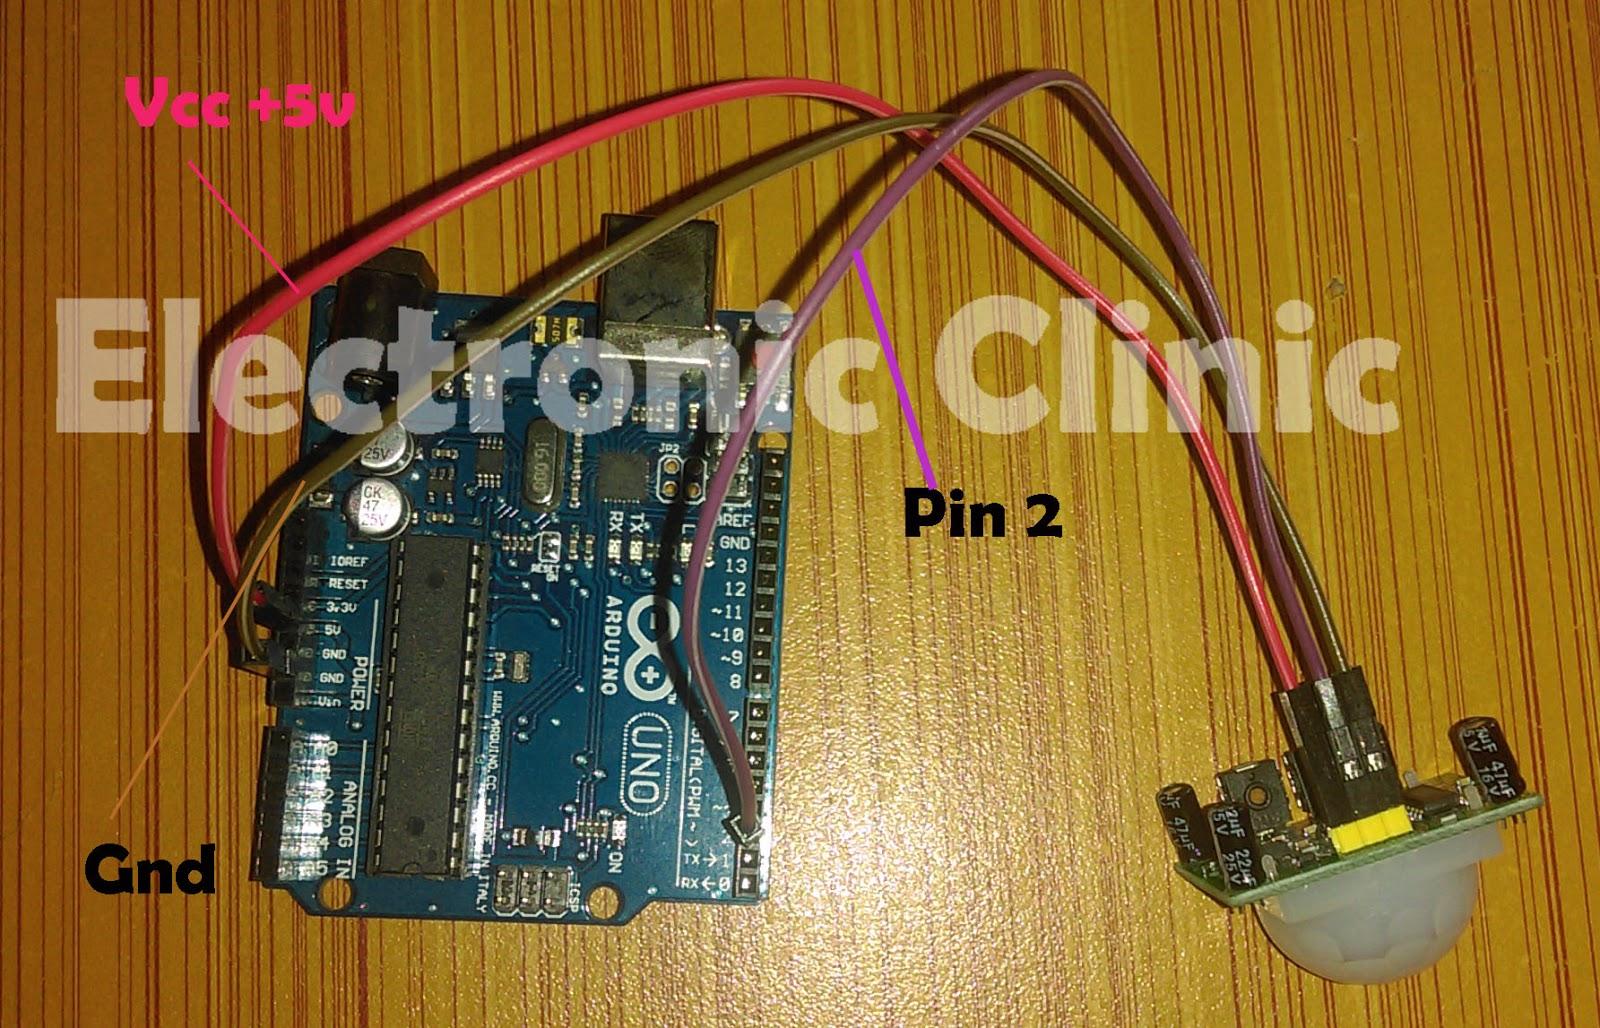 Arduino Plc Scada Solidworks Image Processing Robotics Power Hardware Wiring Diagram Picture